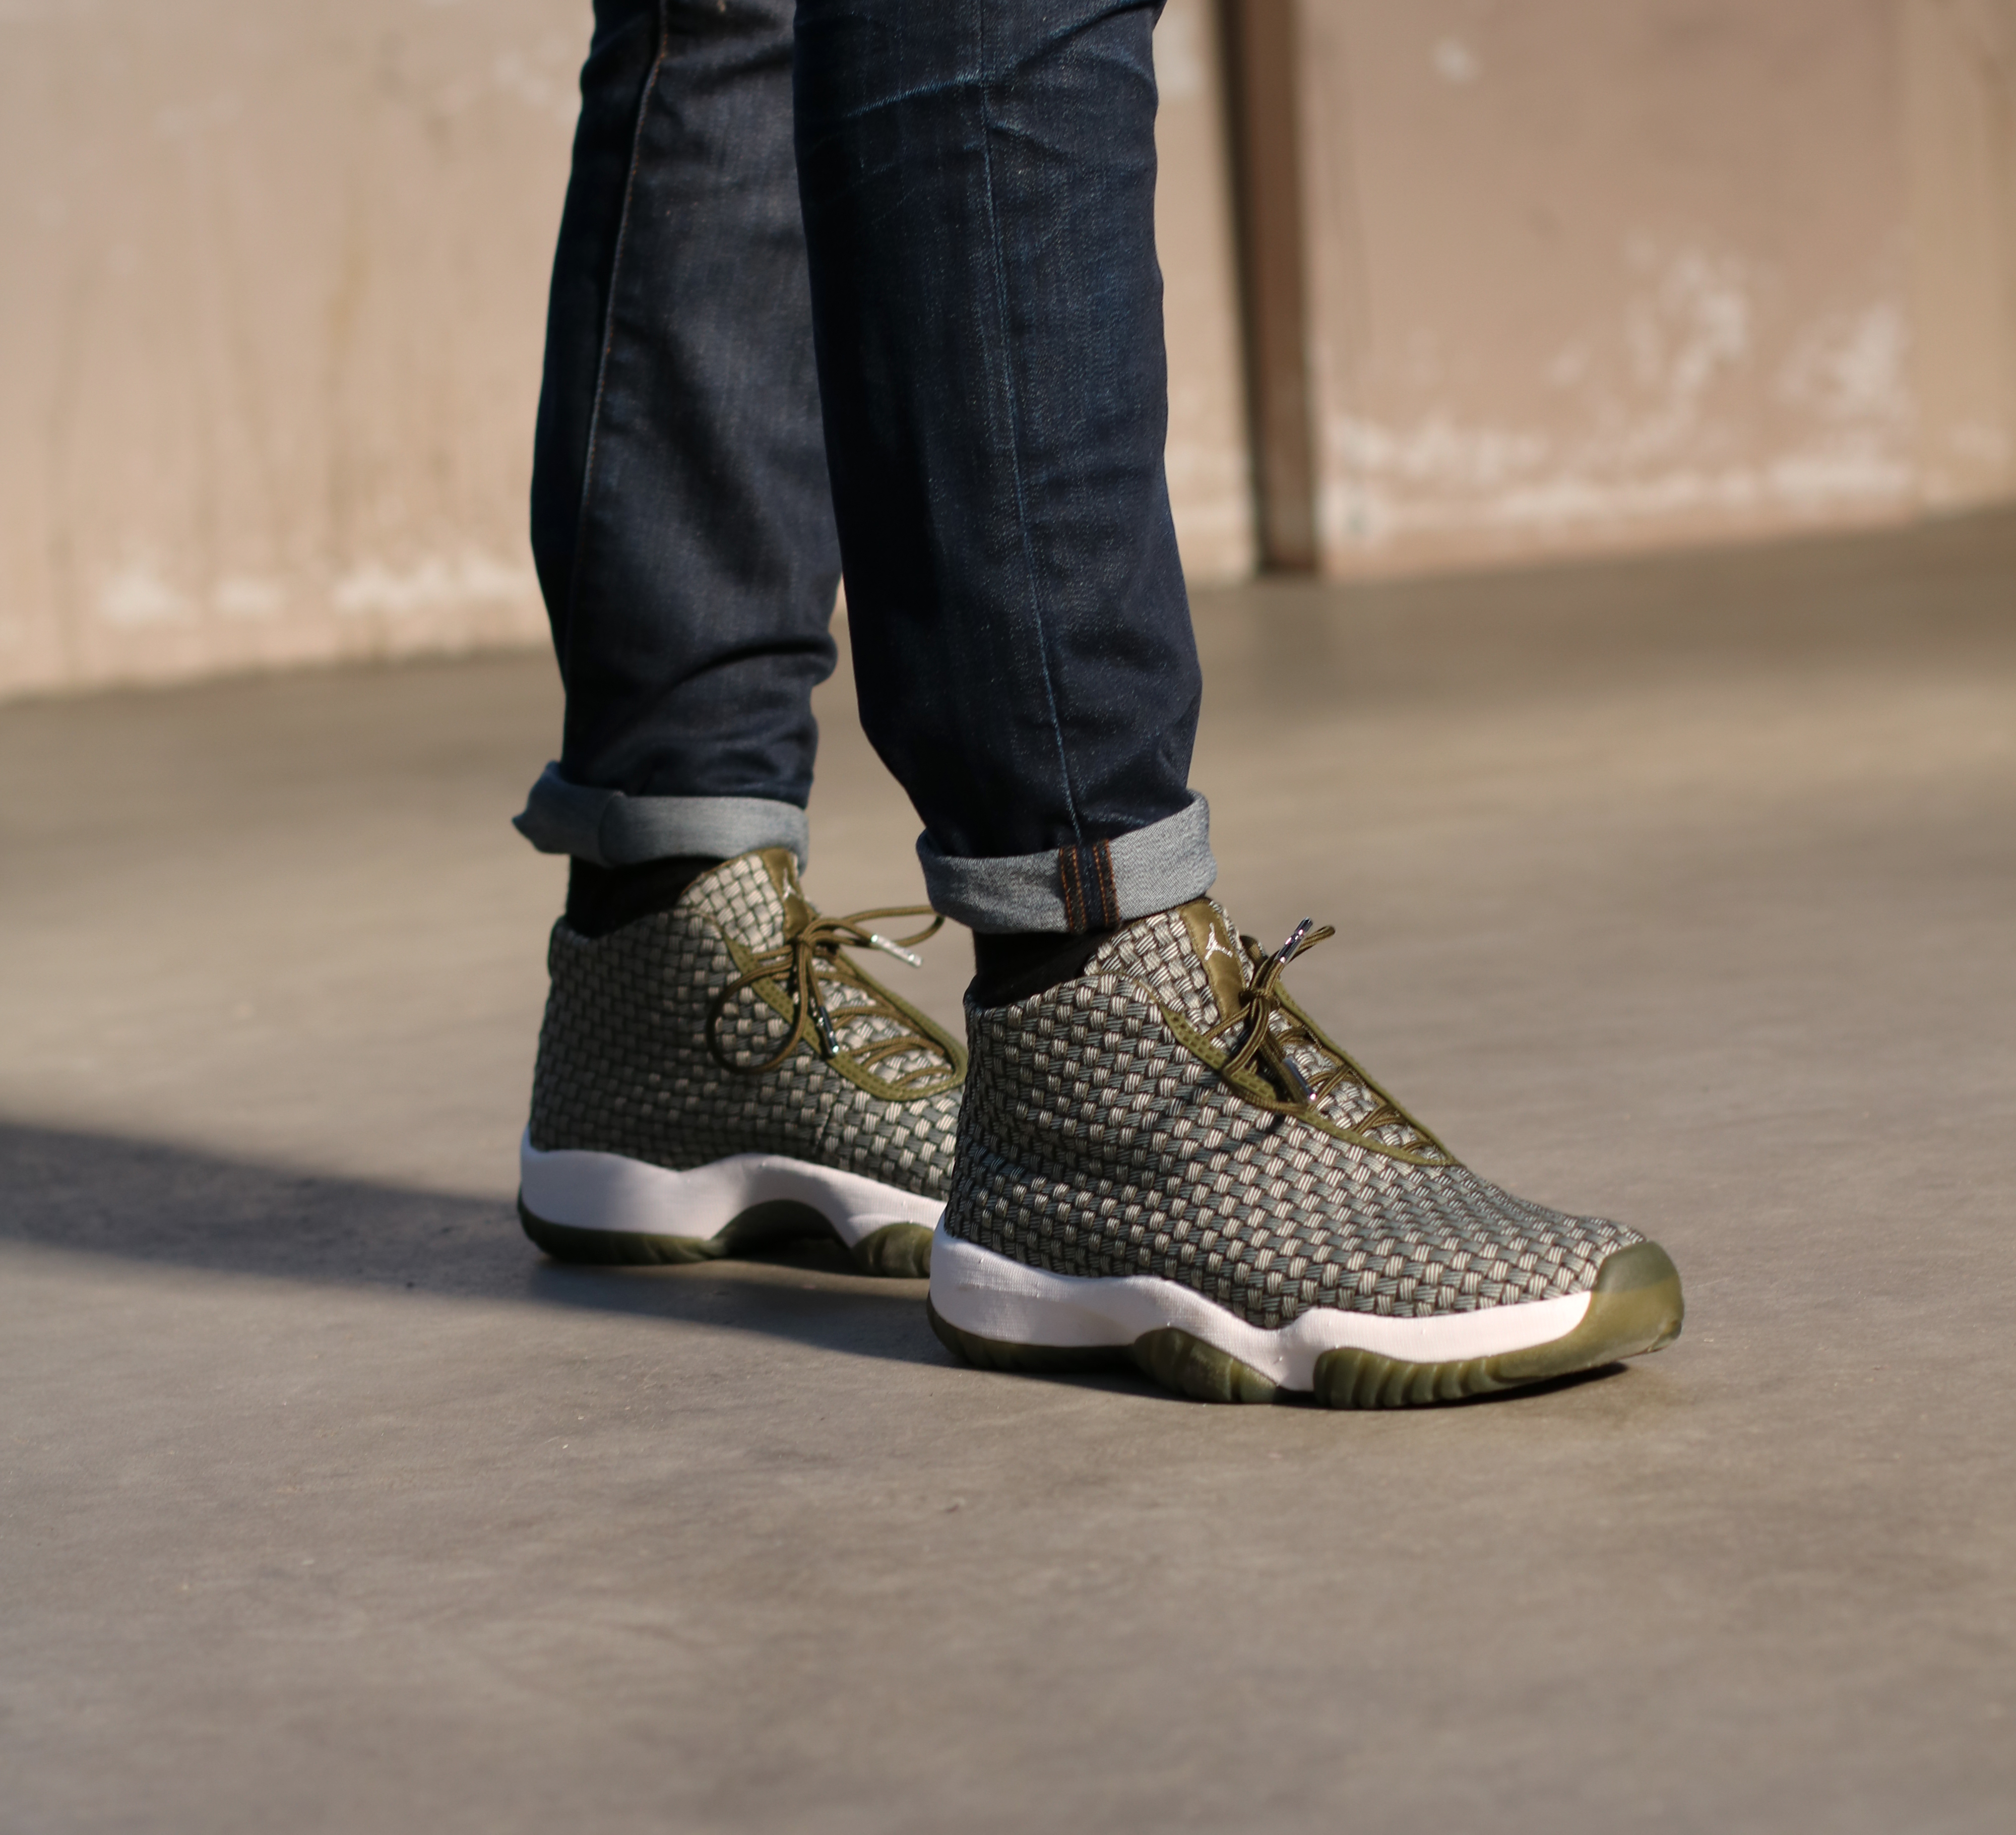 Nieuw: Air Jordan Future 'Olive